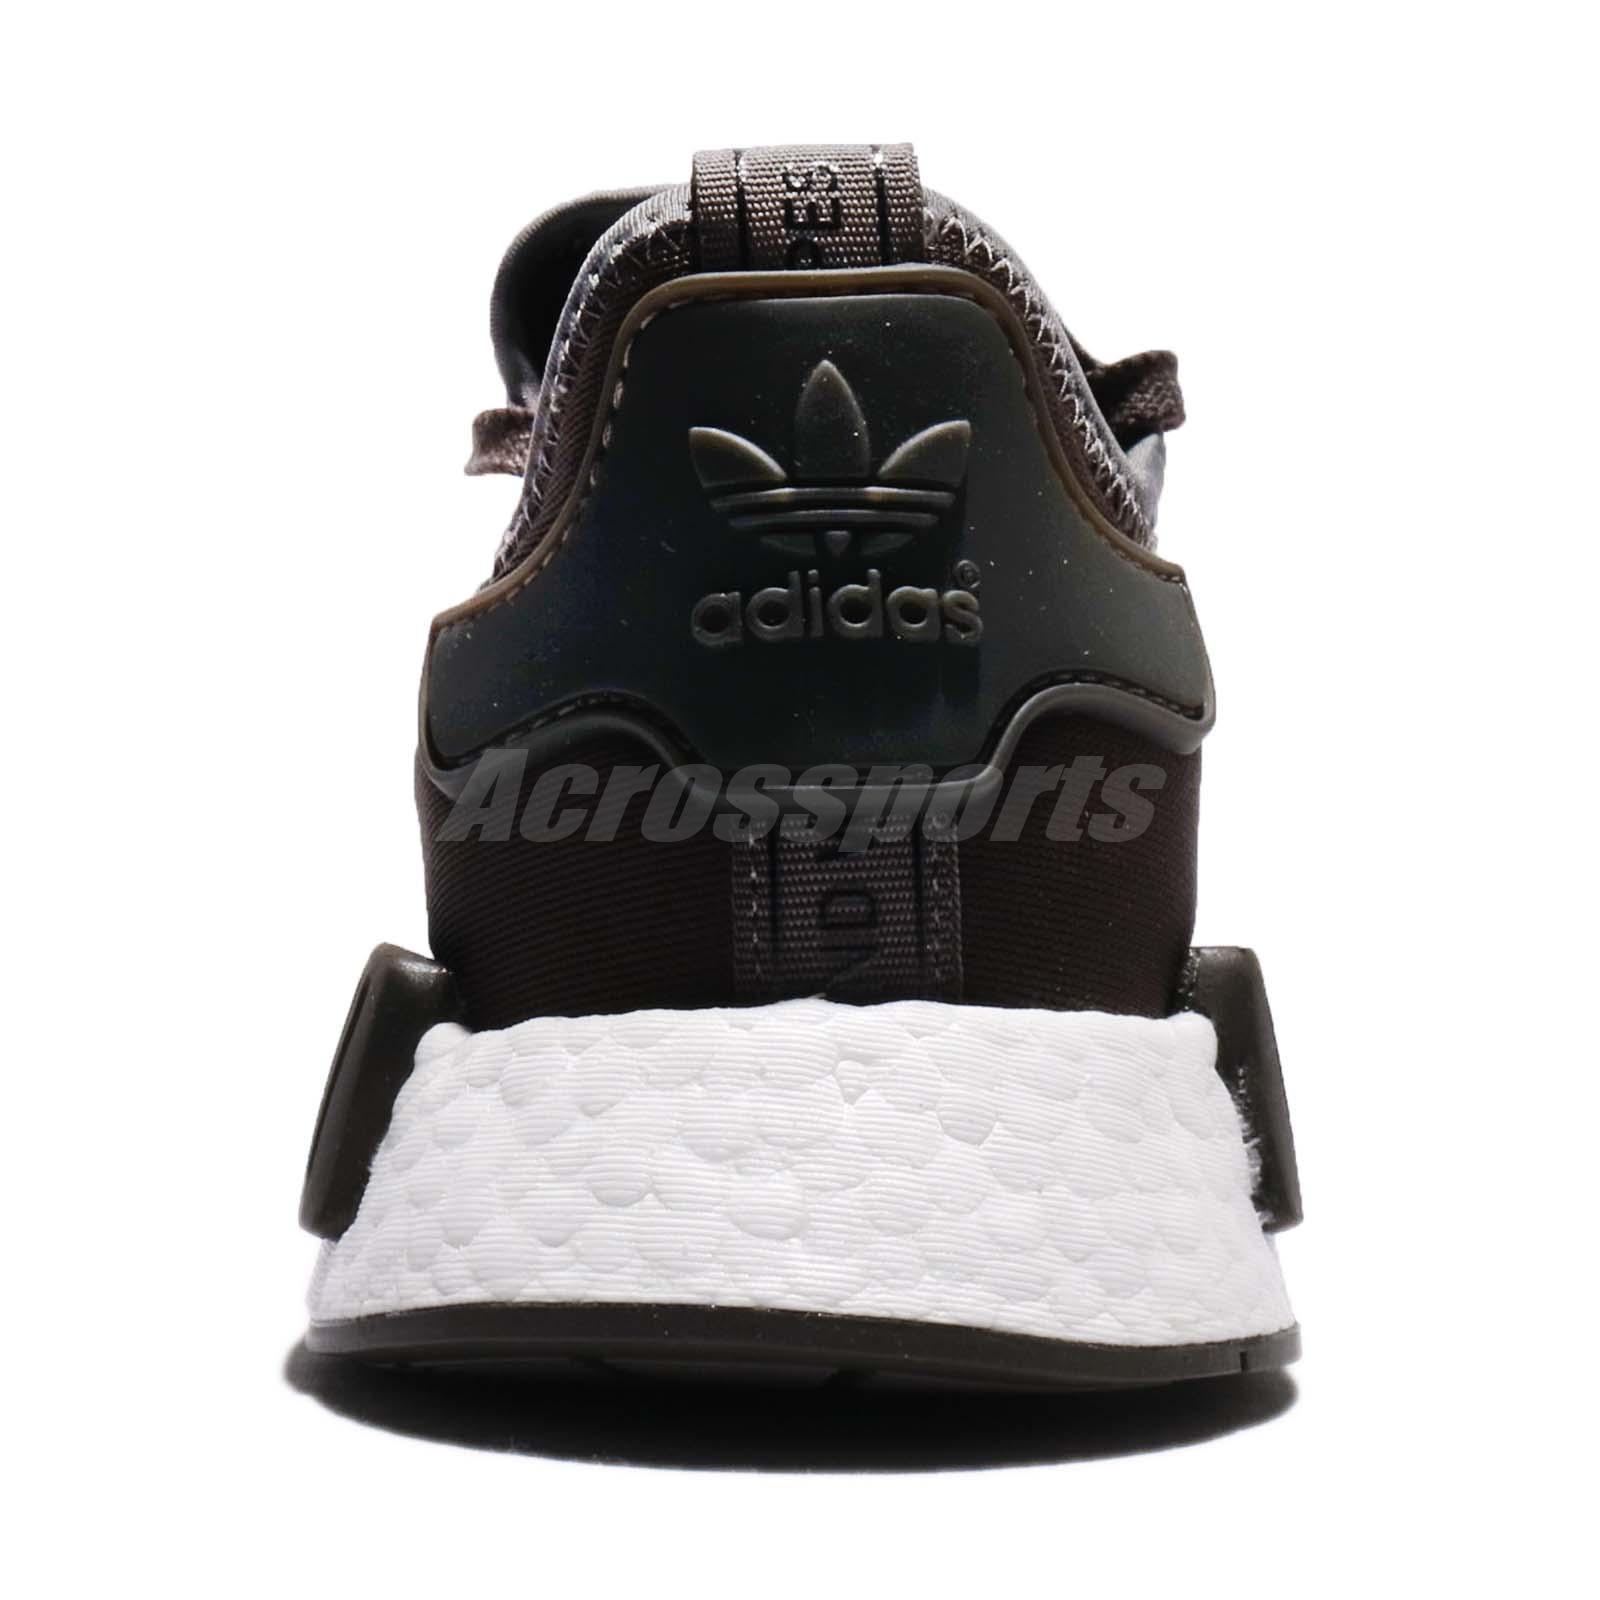 92c587335f34d adidas Originals NMD R1 Boost Brown Trace Grey Metallic Men Shoes ...